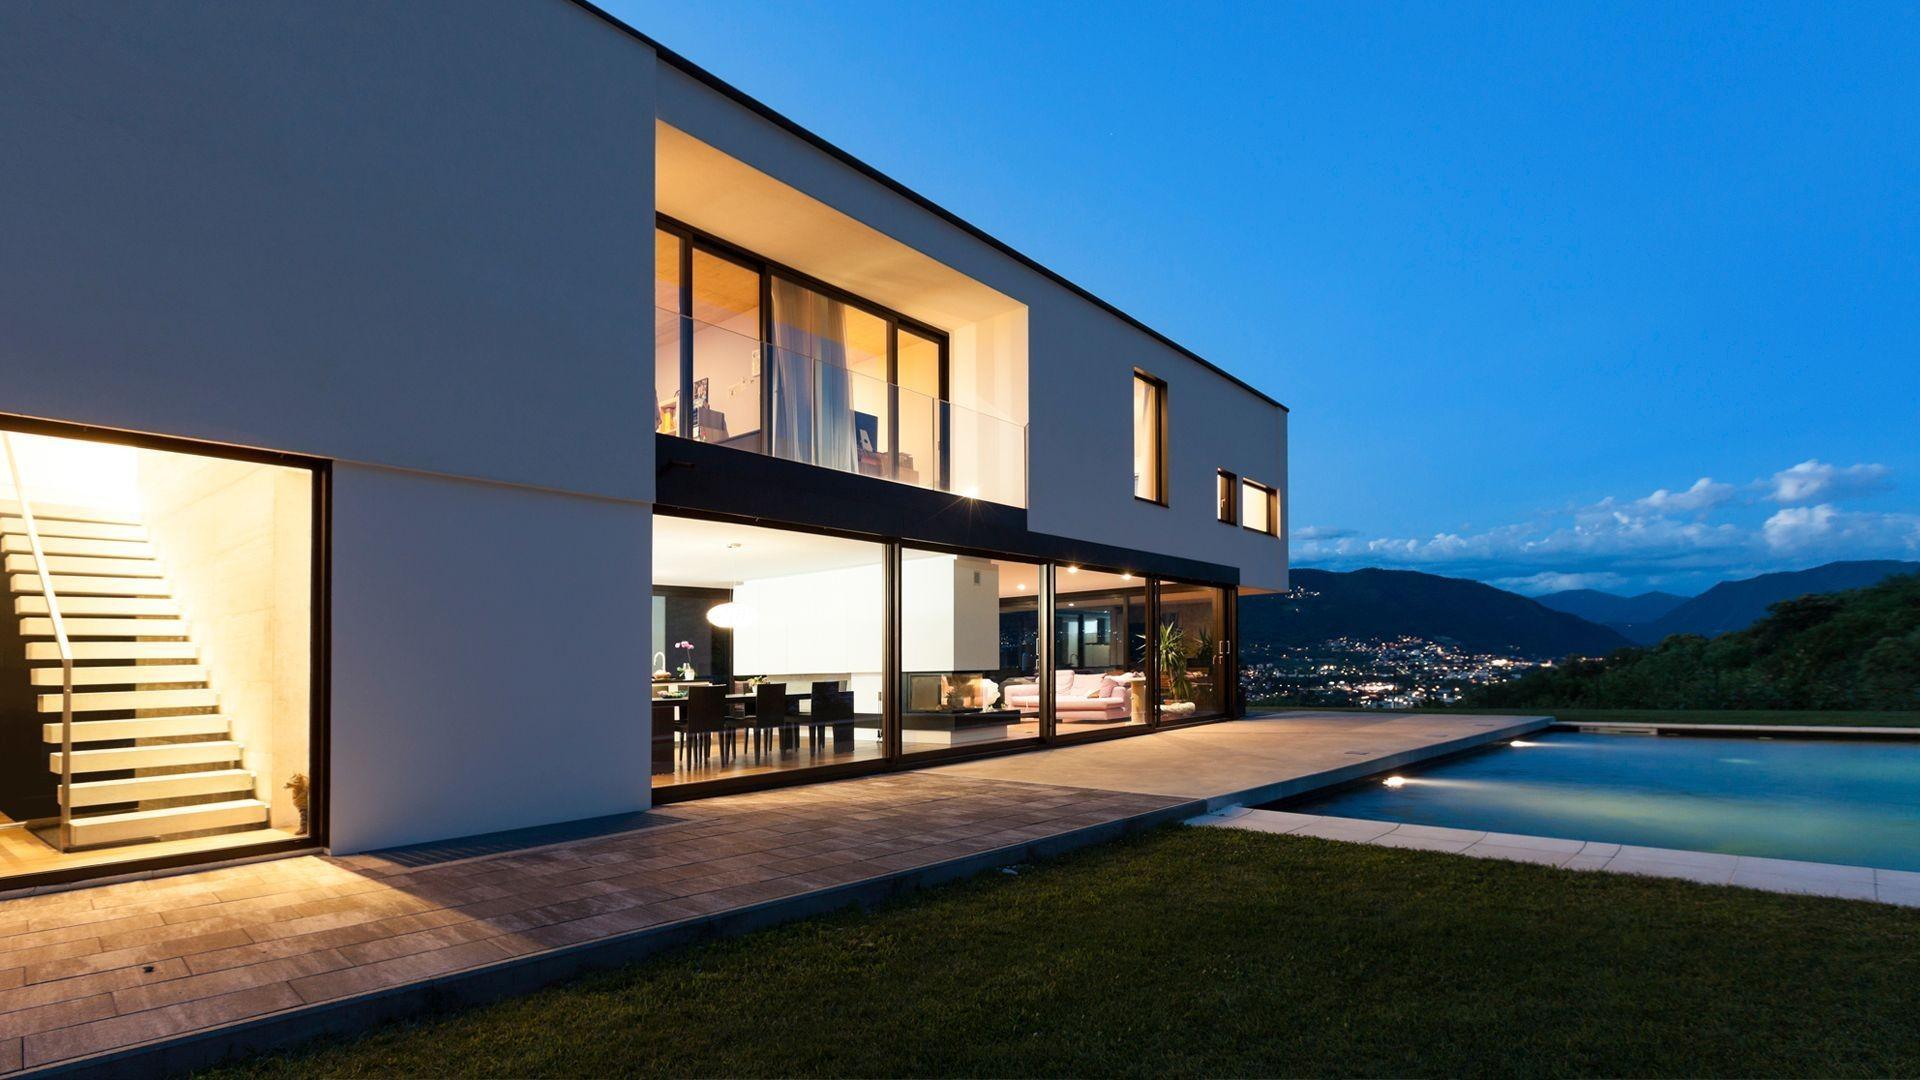 Empresa de construcción de viviendas en Castellón